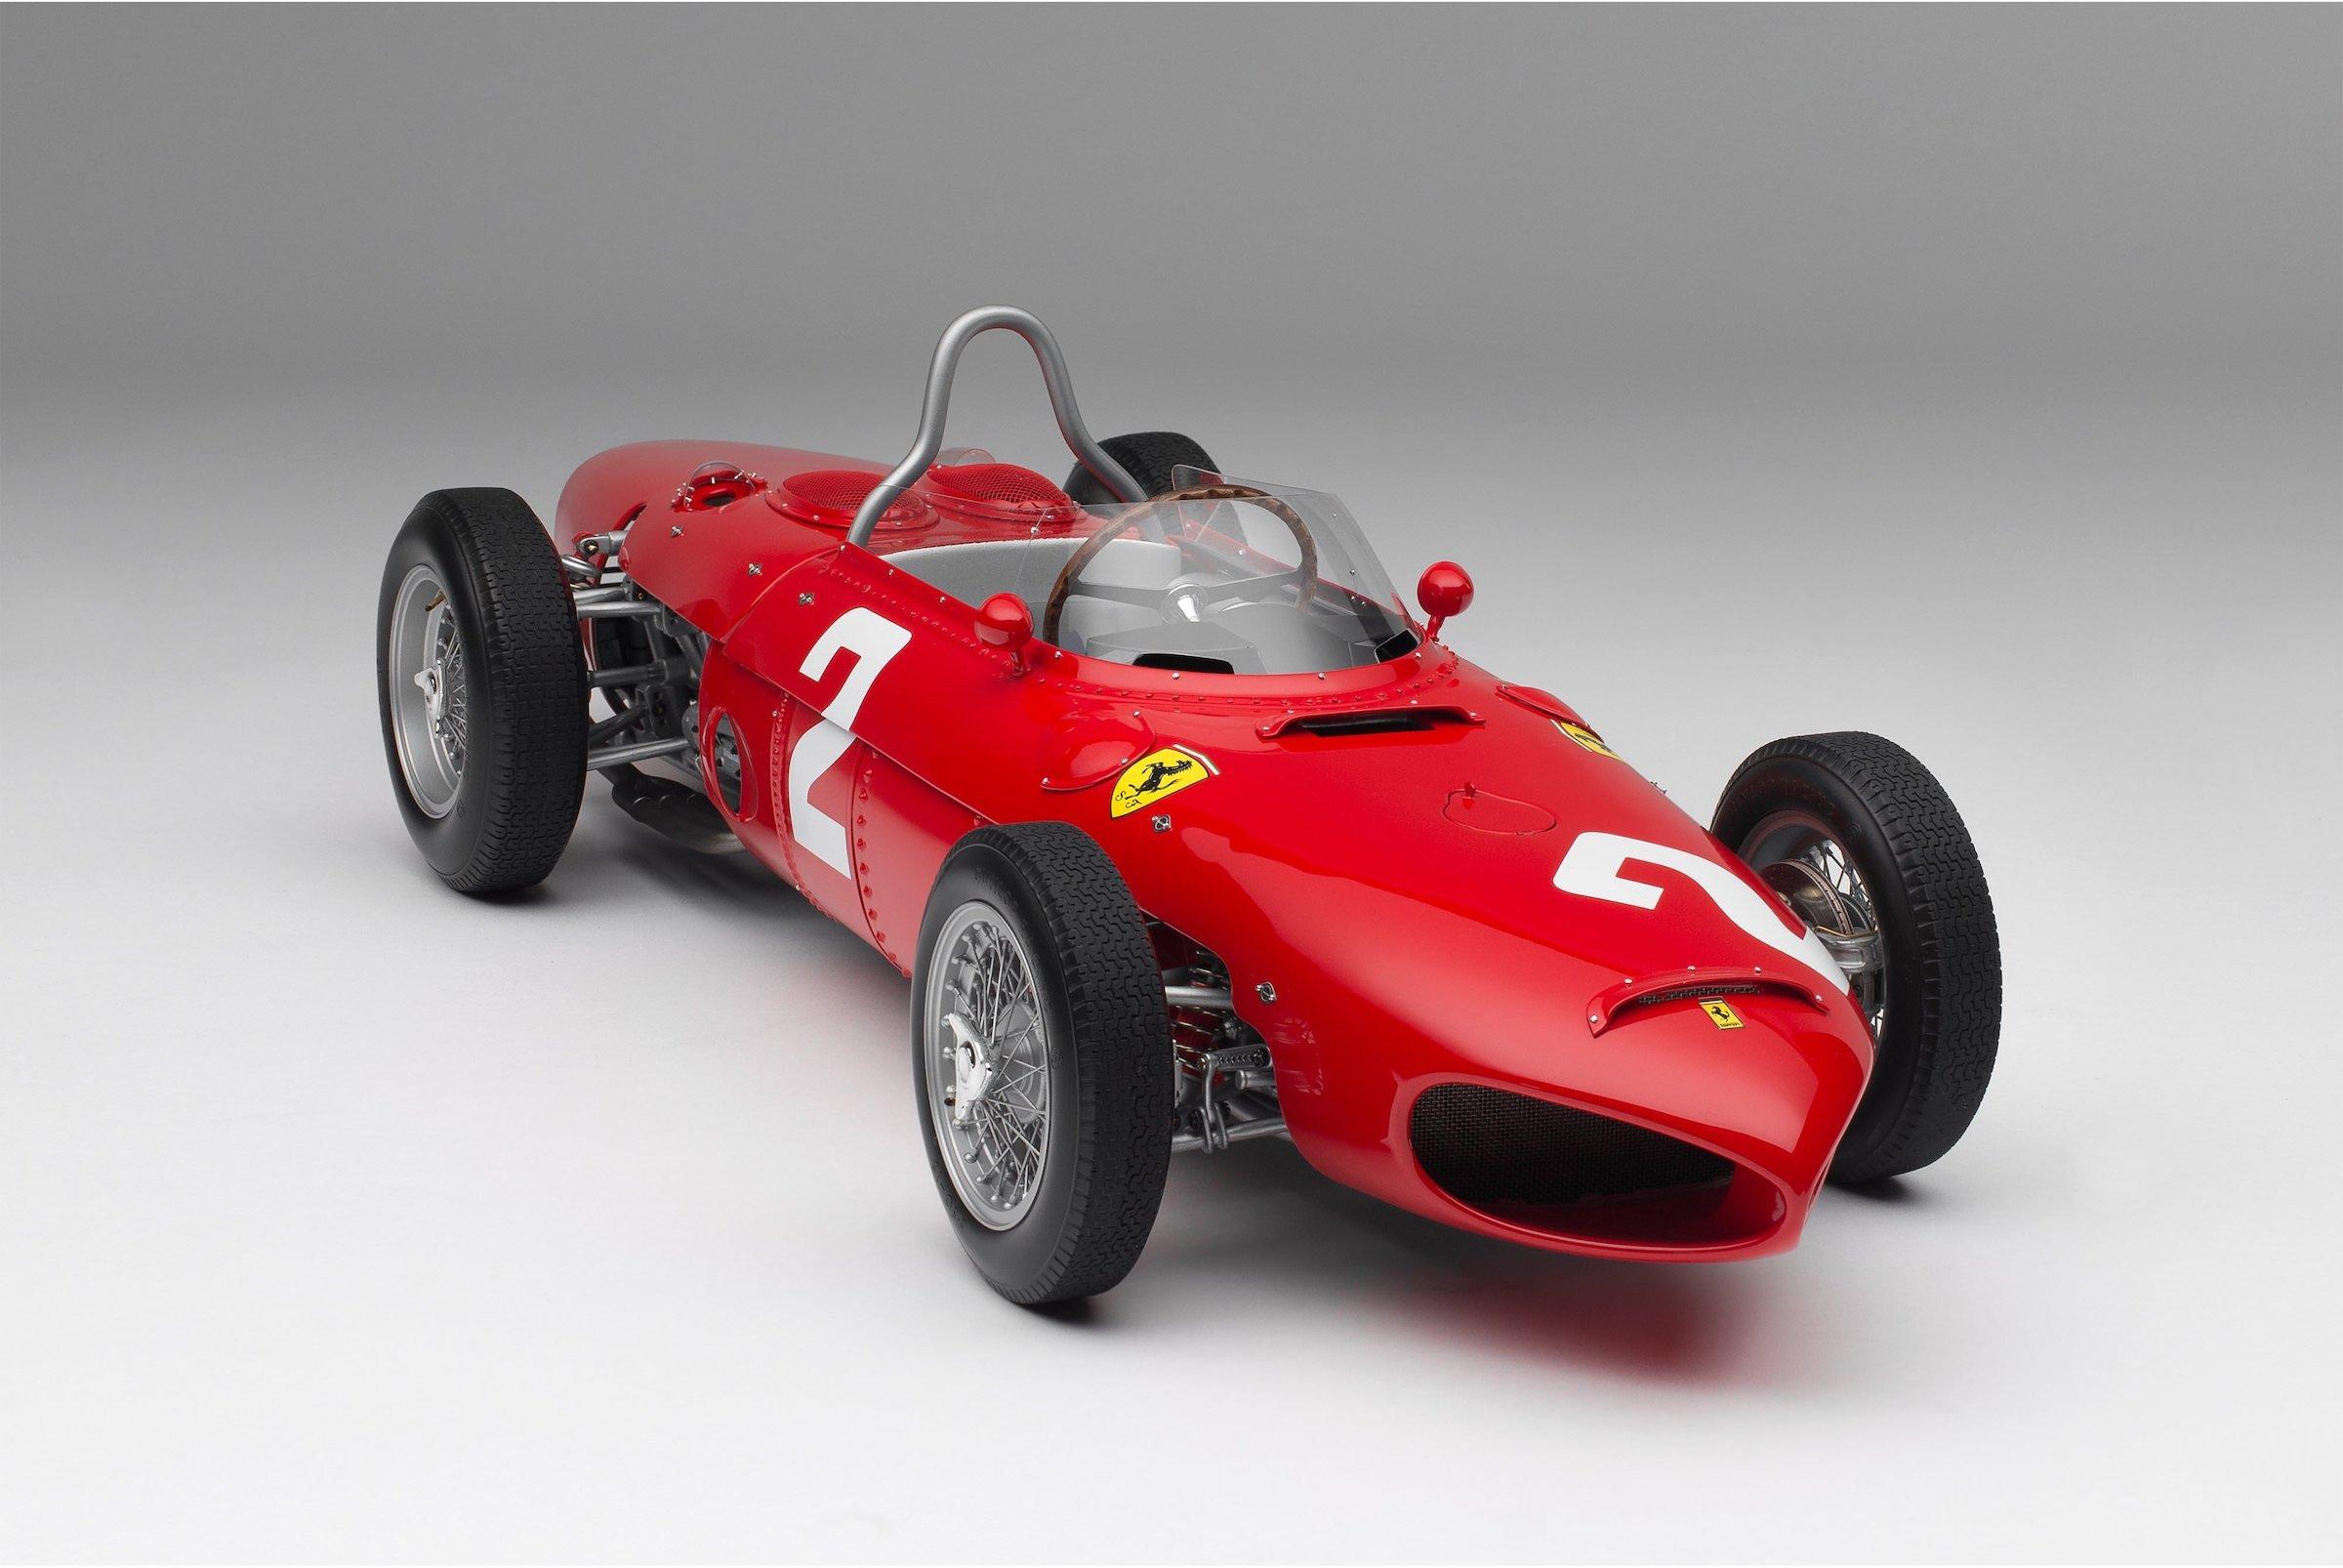 Ferrari 156 F1 Sharknose 1 8th Scale Model 8 460 Usd